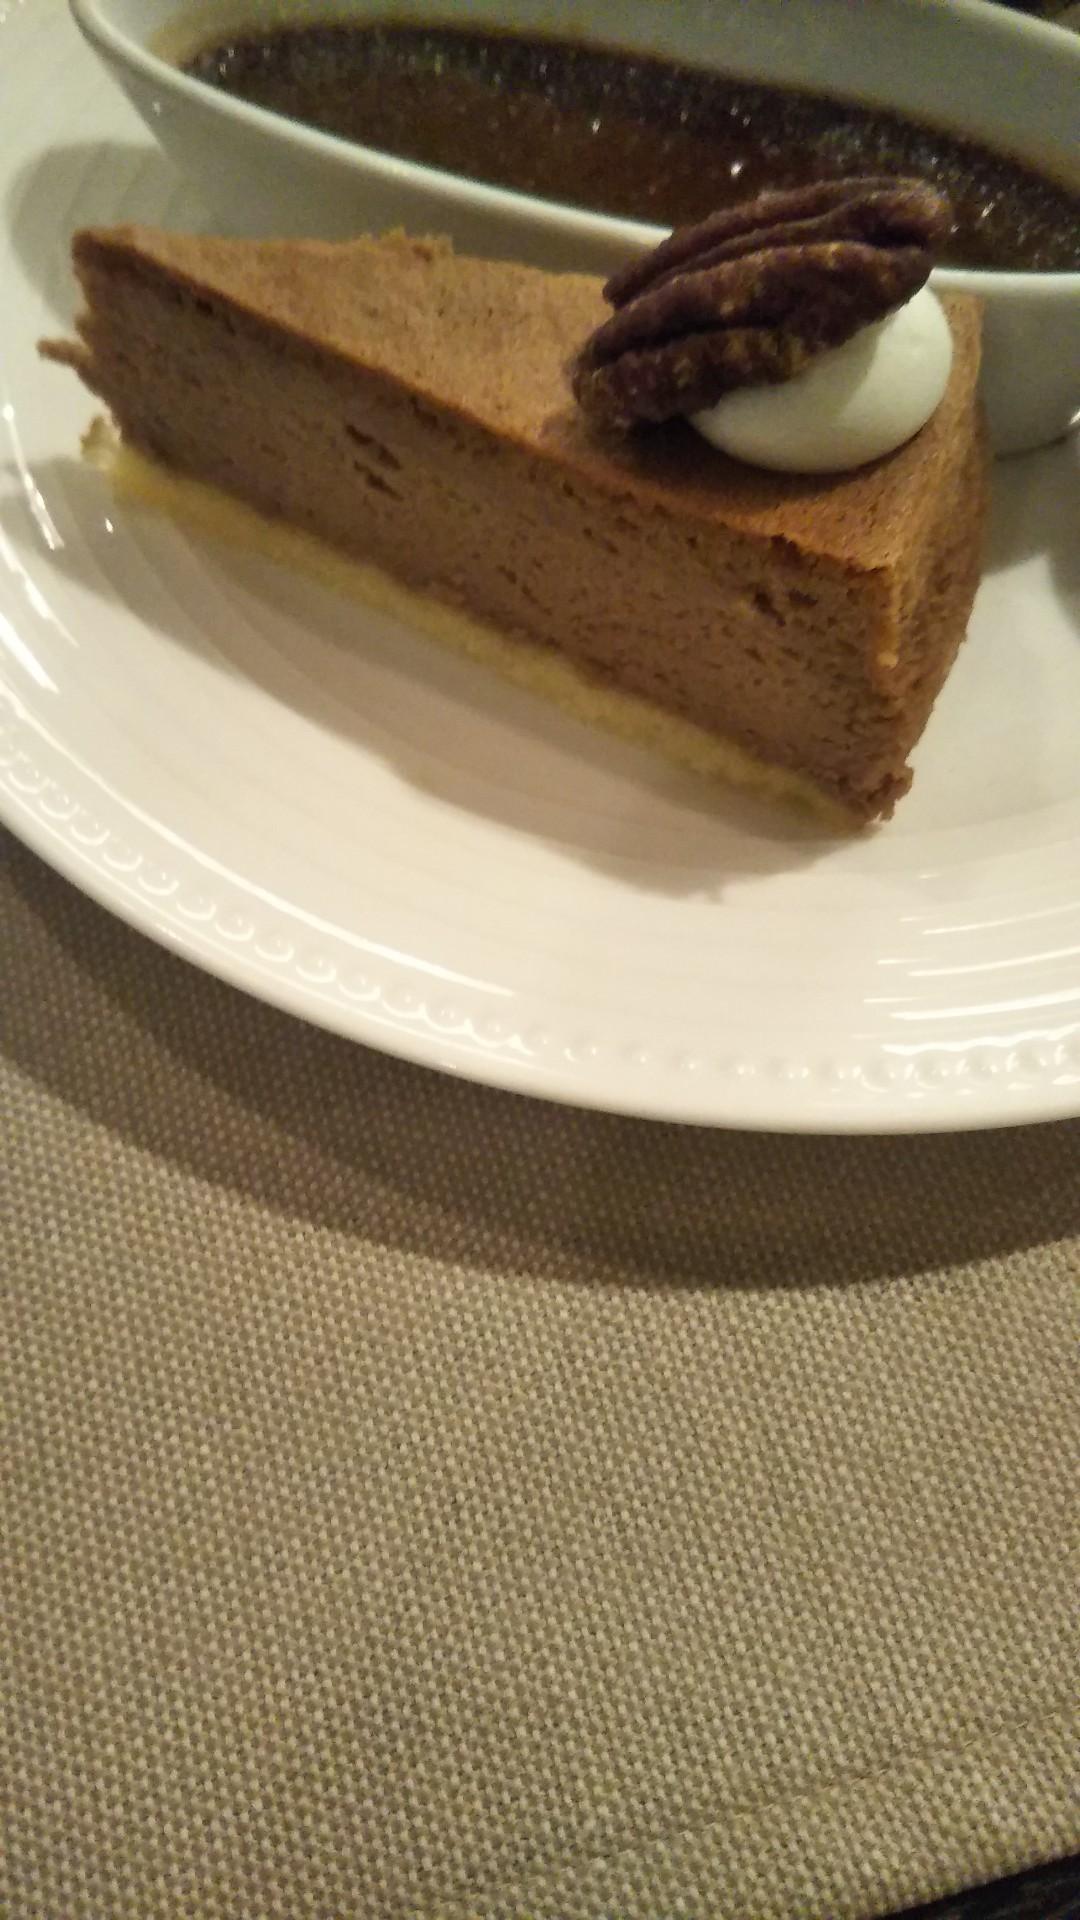 ANAインターコンチネンタルホテル東京 シャンパン・バー チョコレート・スイーツブッフェ_f0076001_22053590.jpg